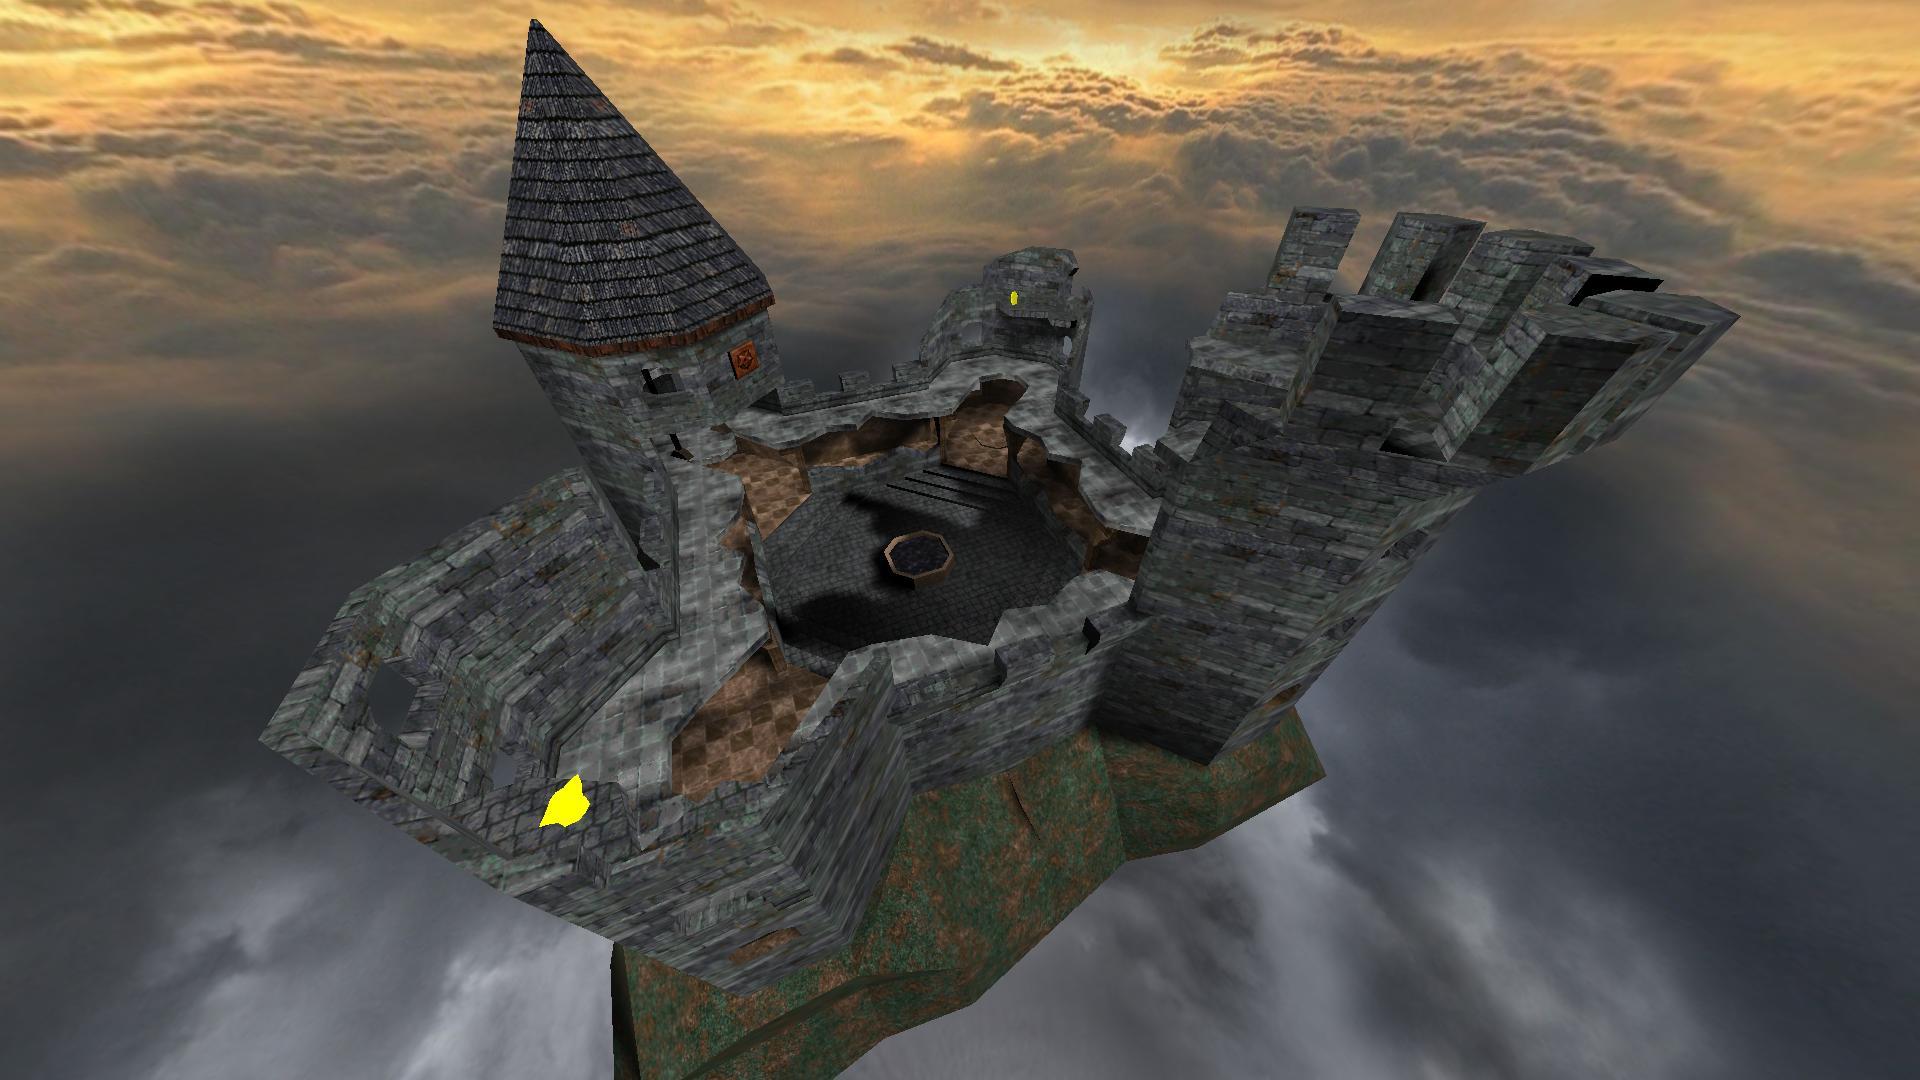 http://www.bandsalat.org/quake/anruin/anruin1.jpg